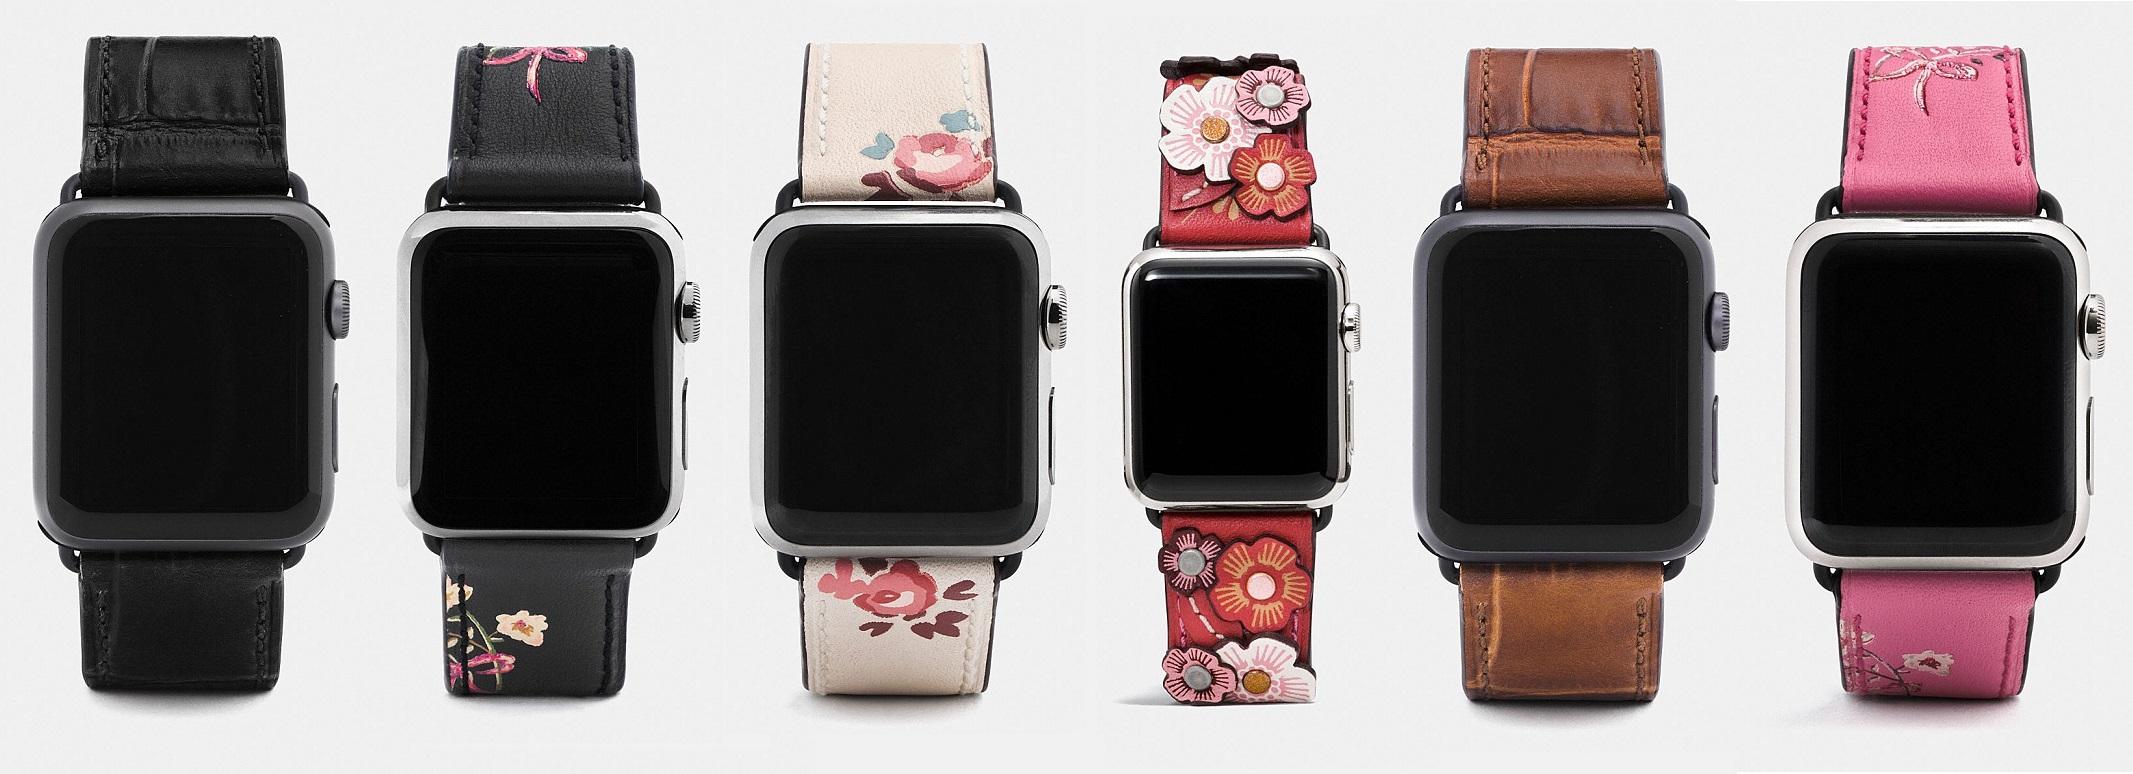 Apple Watch Coach Spring 2018